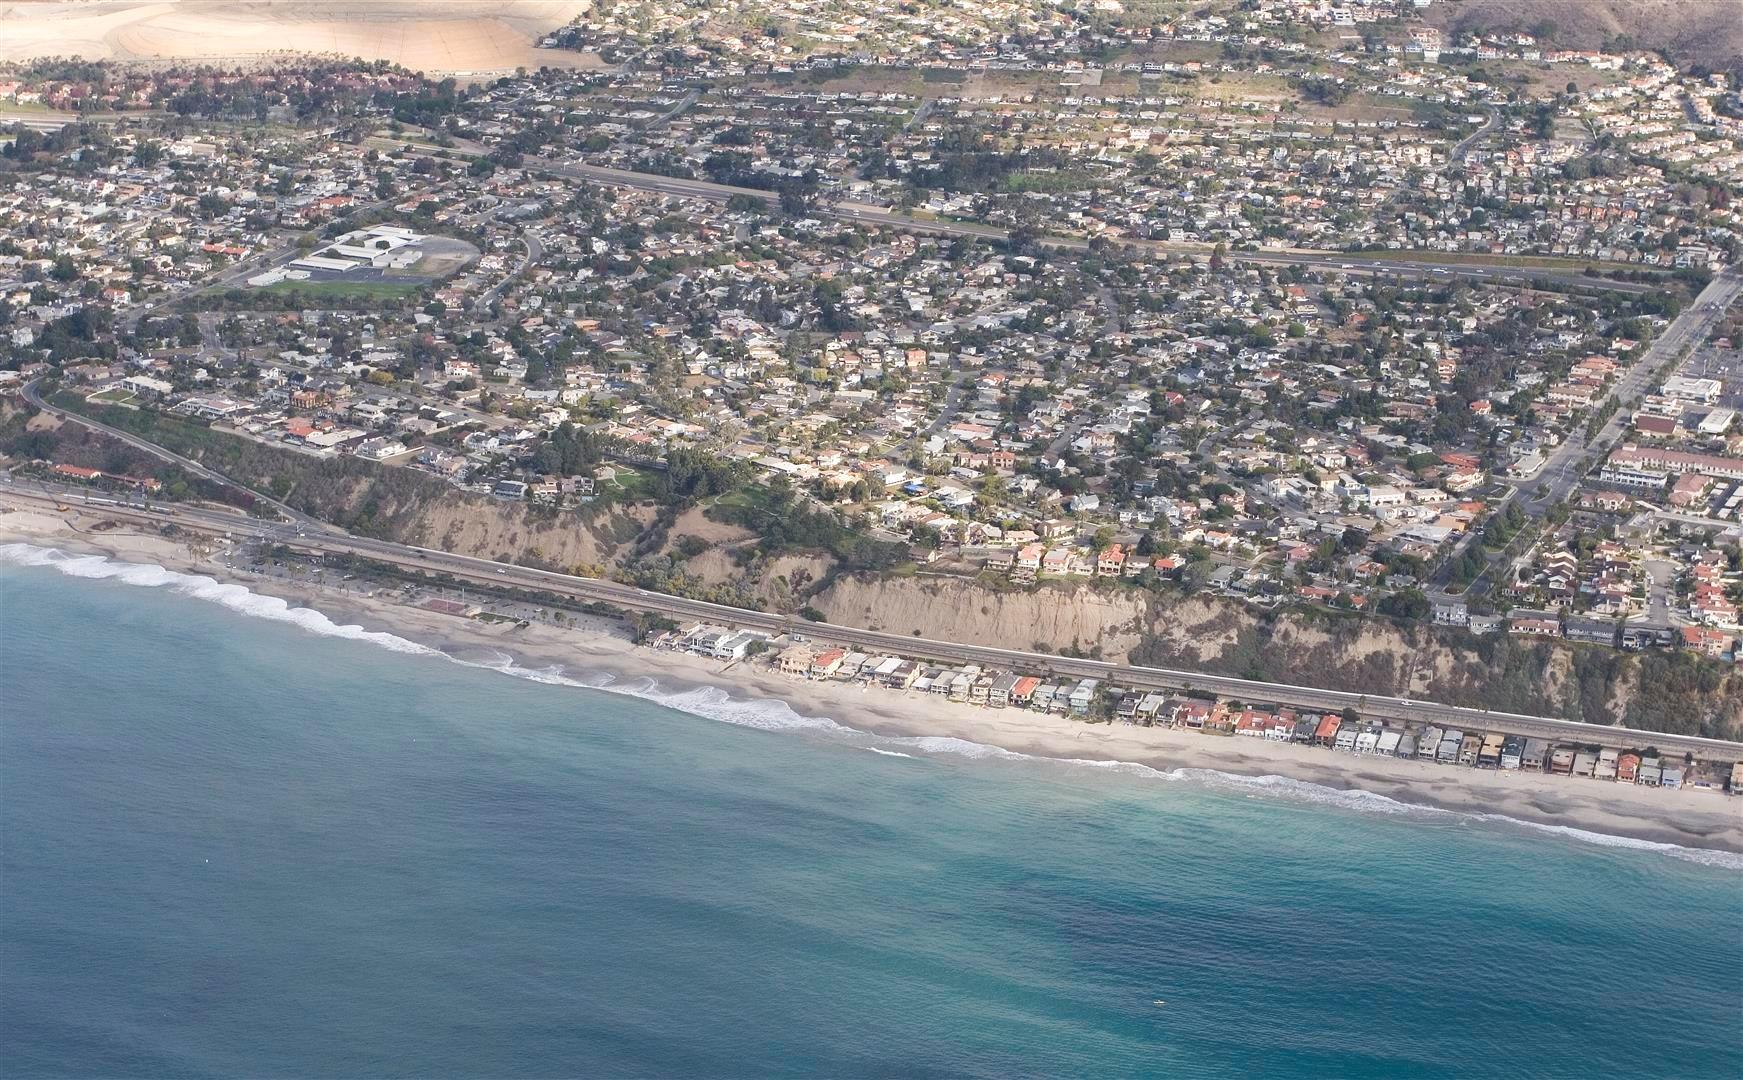 Capistrano Beach Coastline